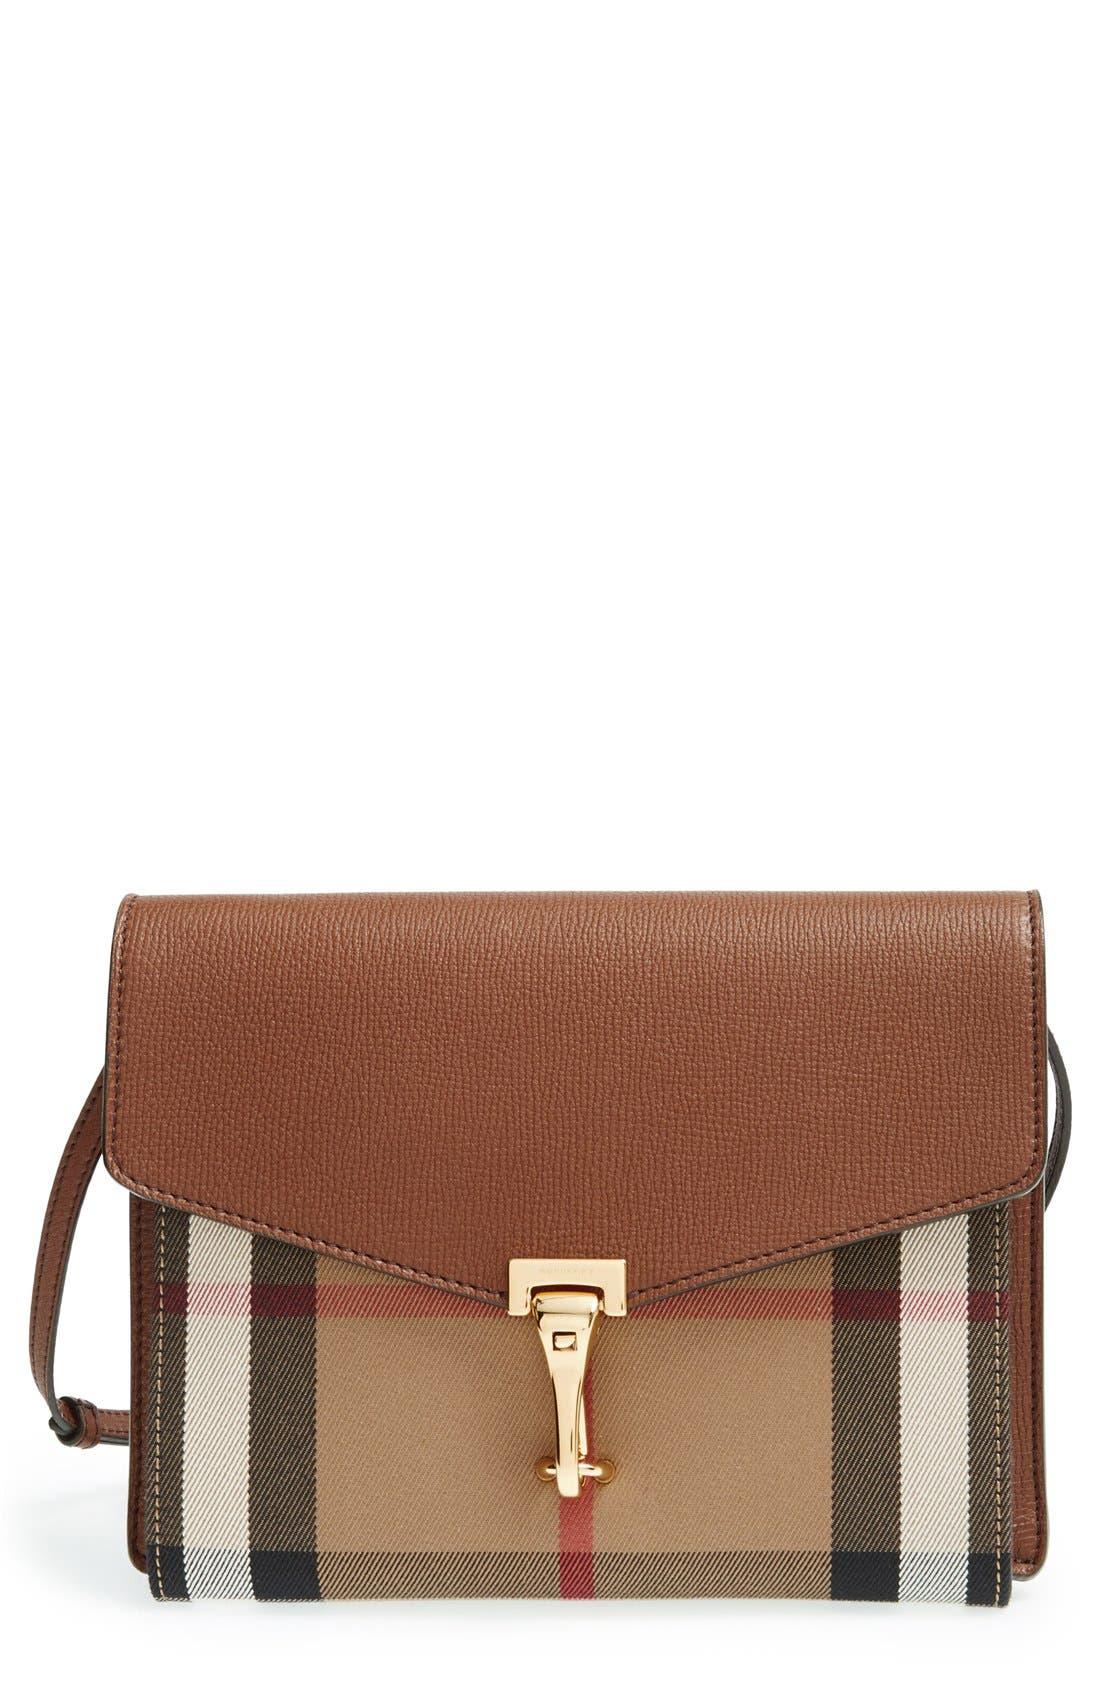 'Small Macken' Check Crossbody Bag,                         Main,                         color, TAN